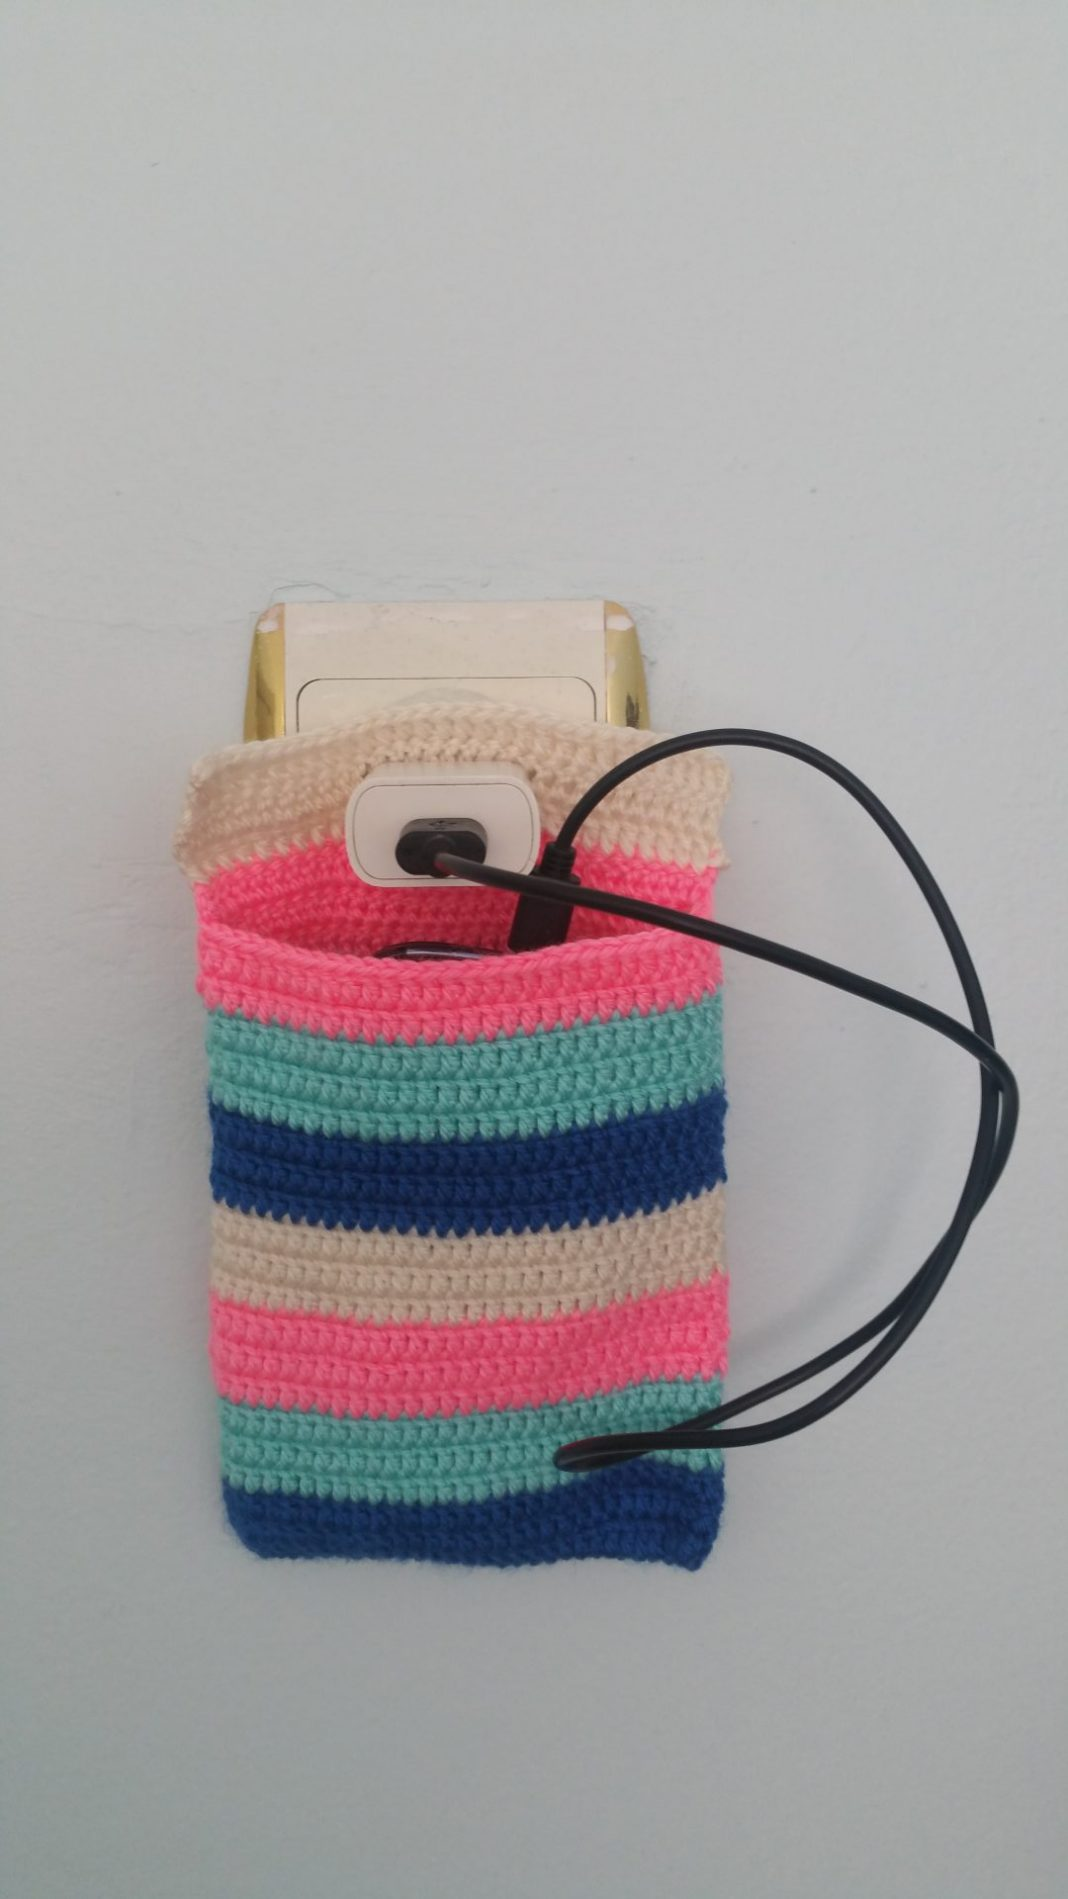 rengarenk-orgu-telefon-tutucu-yapimi